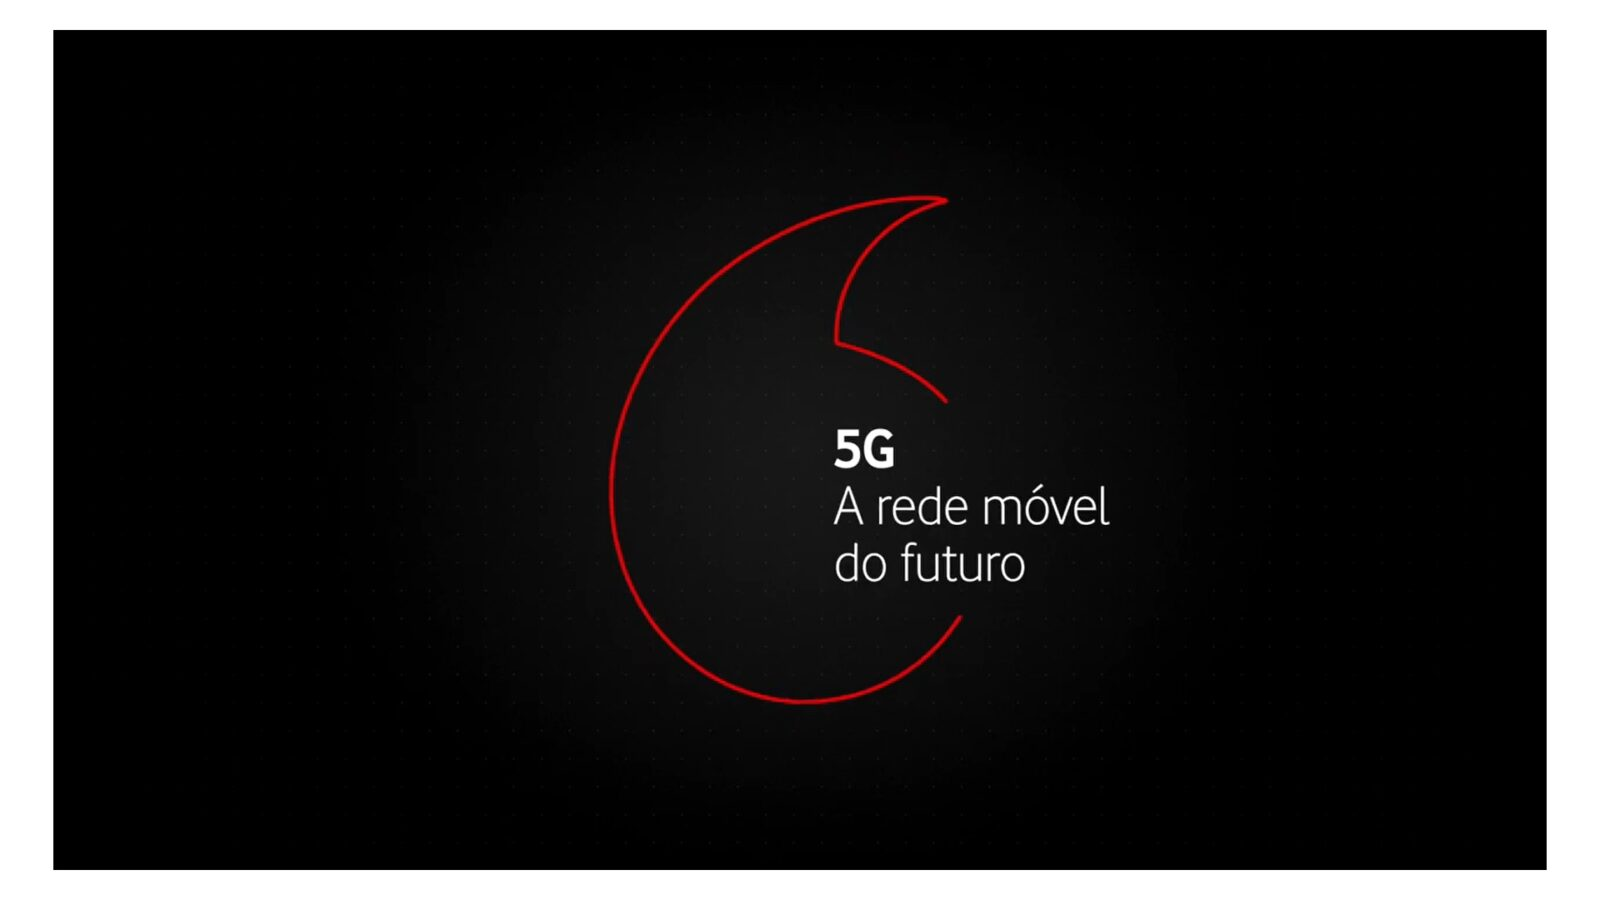 Vodafone Portugal 5G